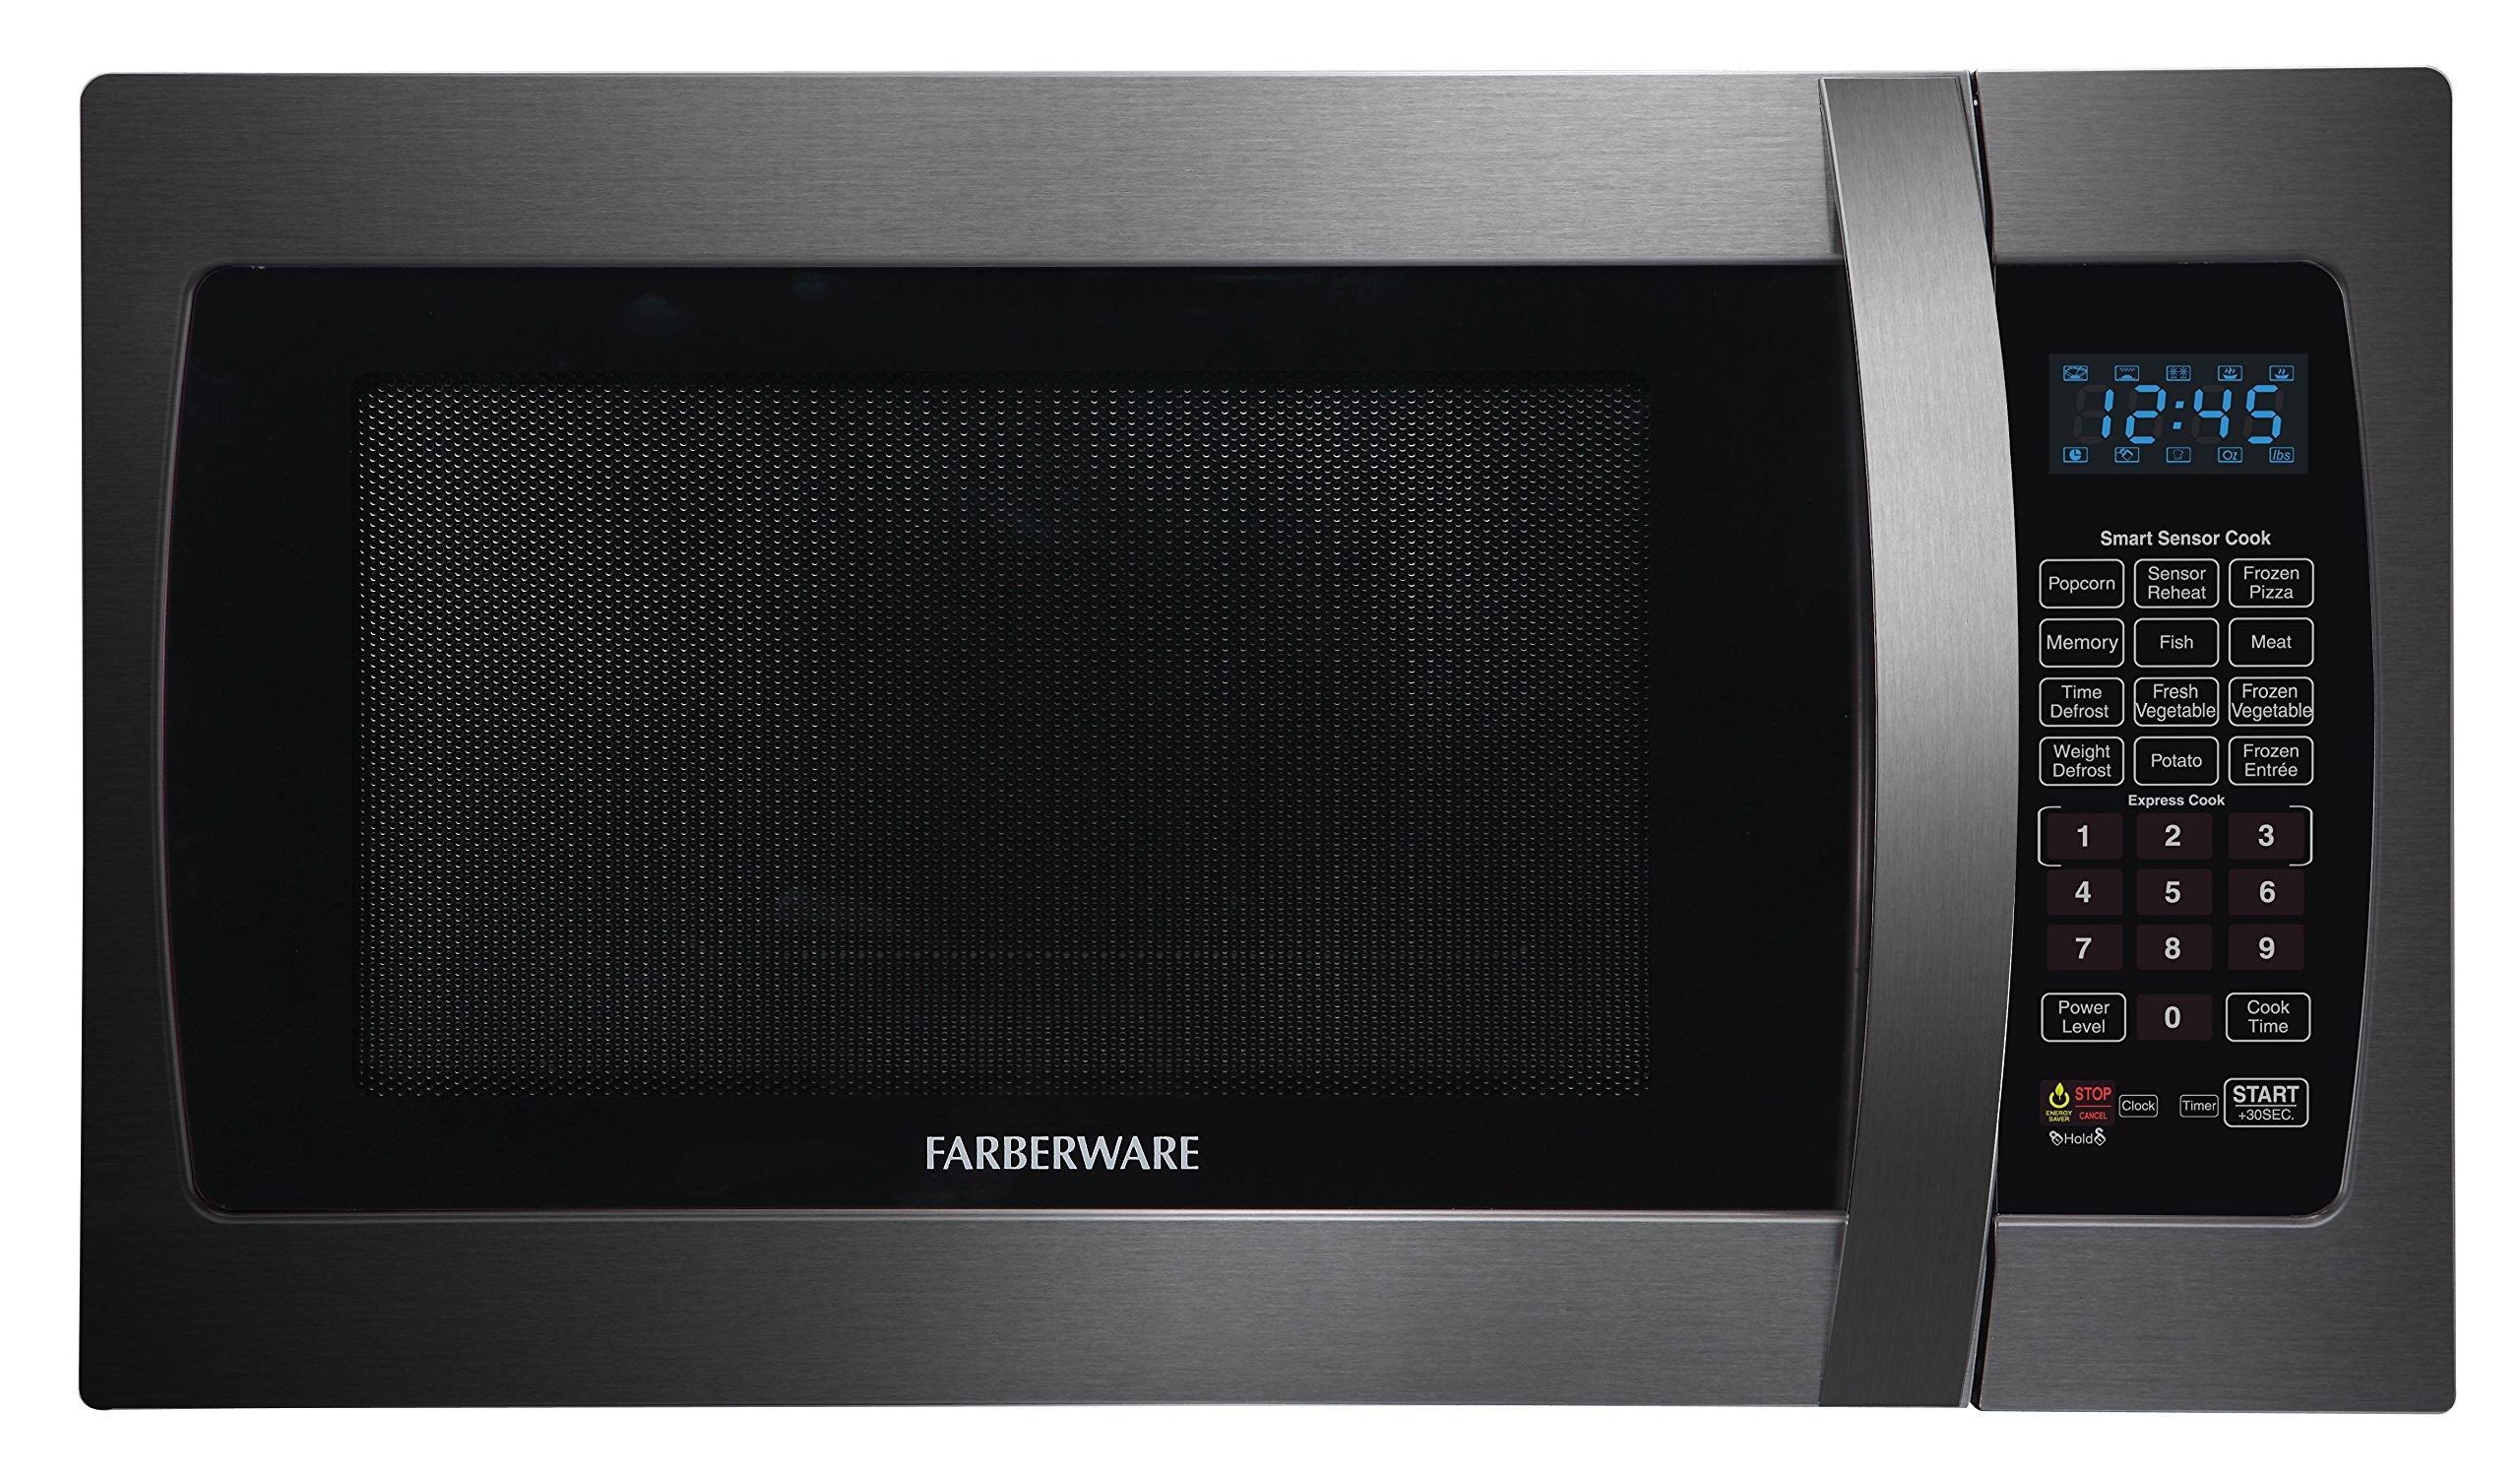 Farberware Black FMO13AHTBSE 1.3-Cubic-Foot 1100-Watt Microwave Oven with Smart Sensor Cooking, Black Stainless Steel